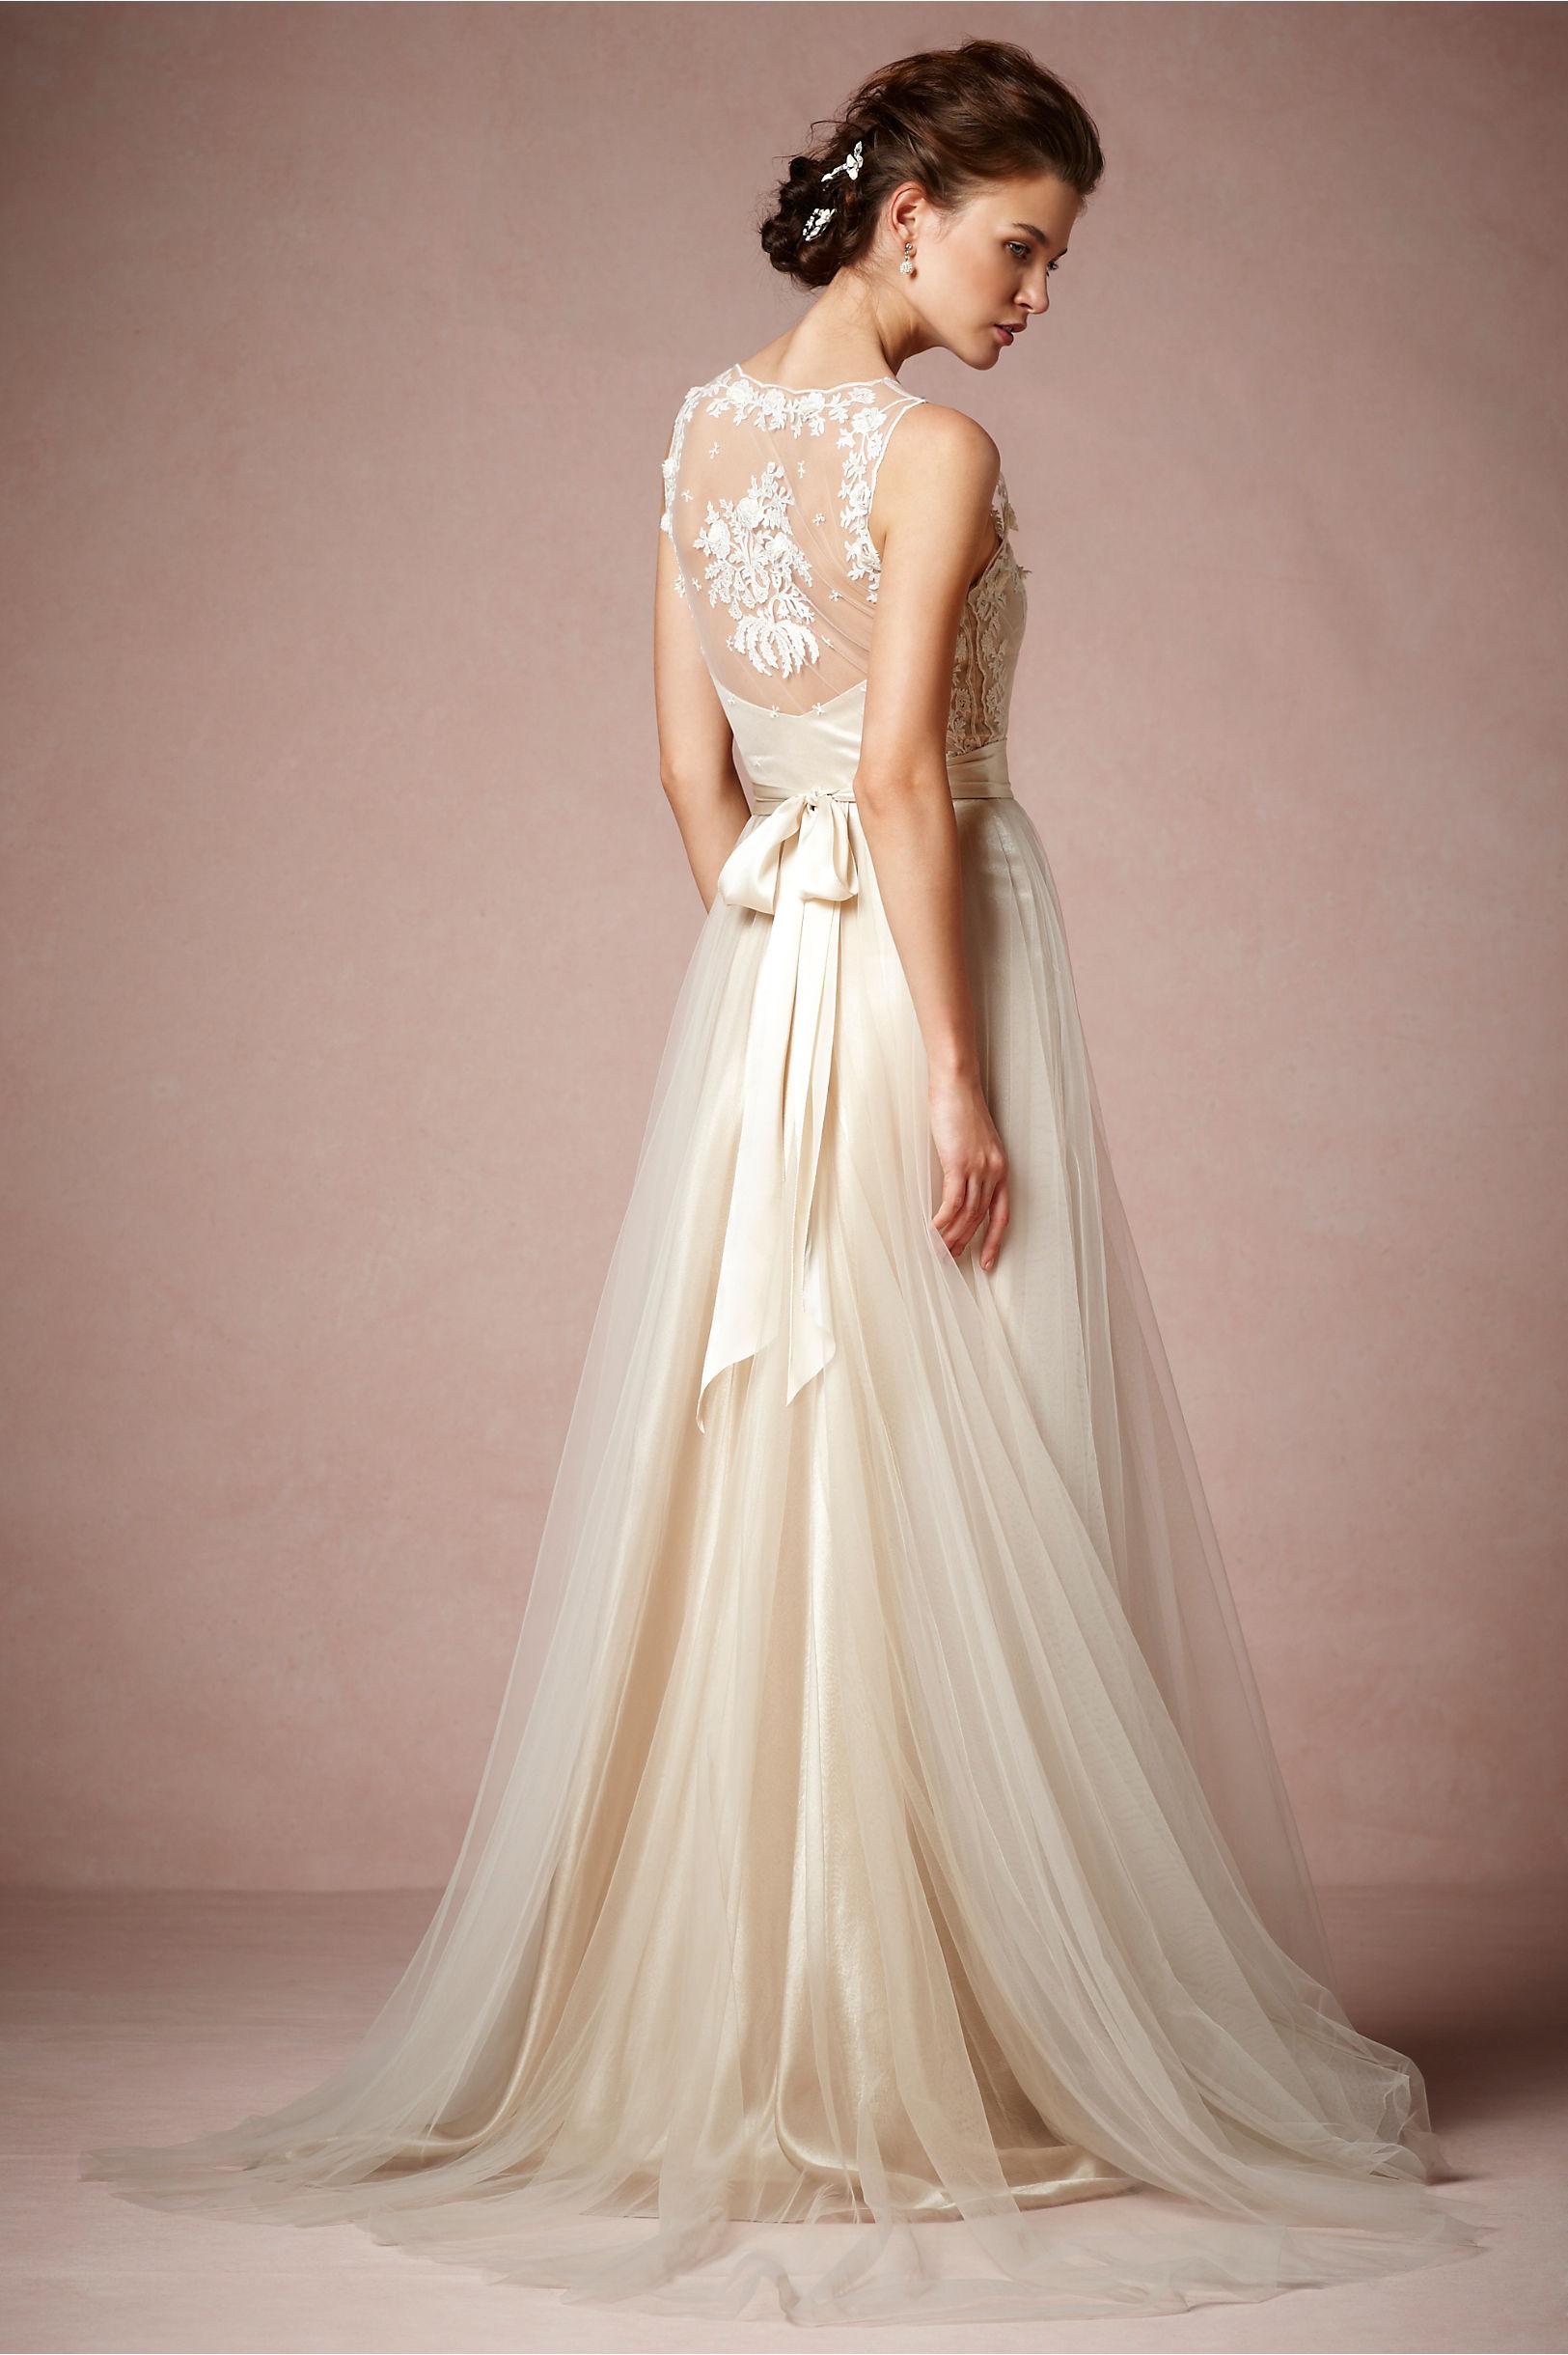 Onyx Gown kr 10 863,-